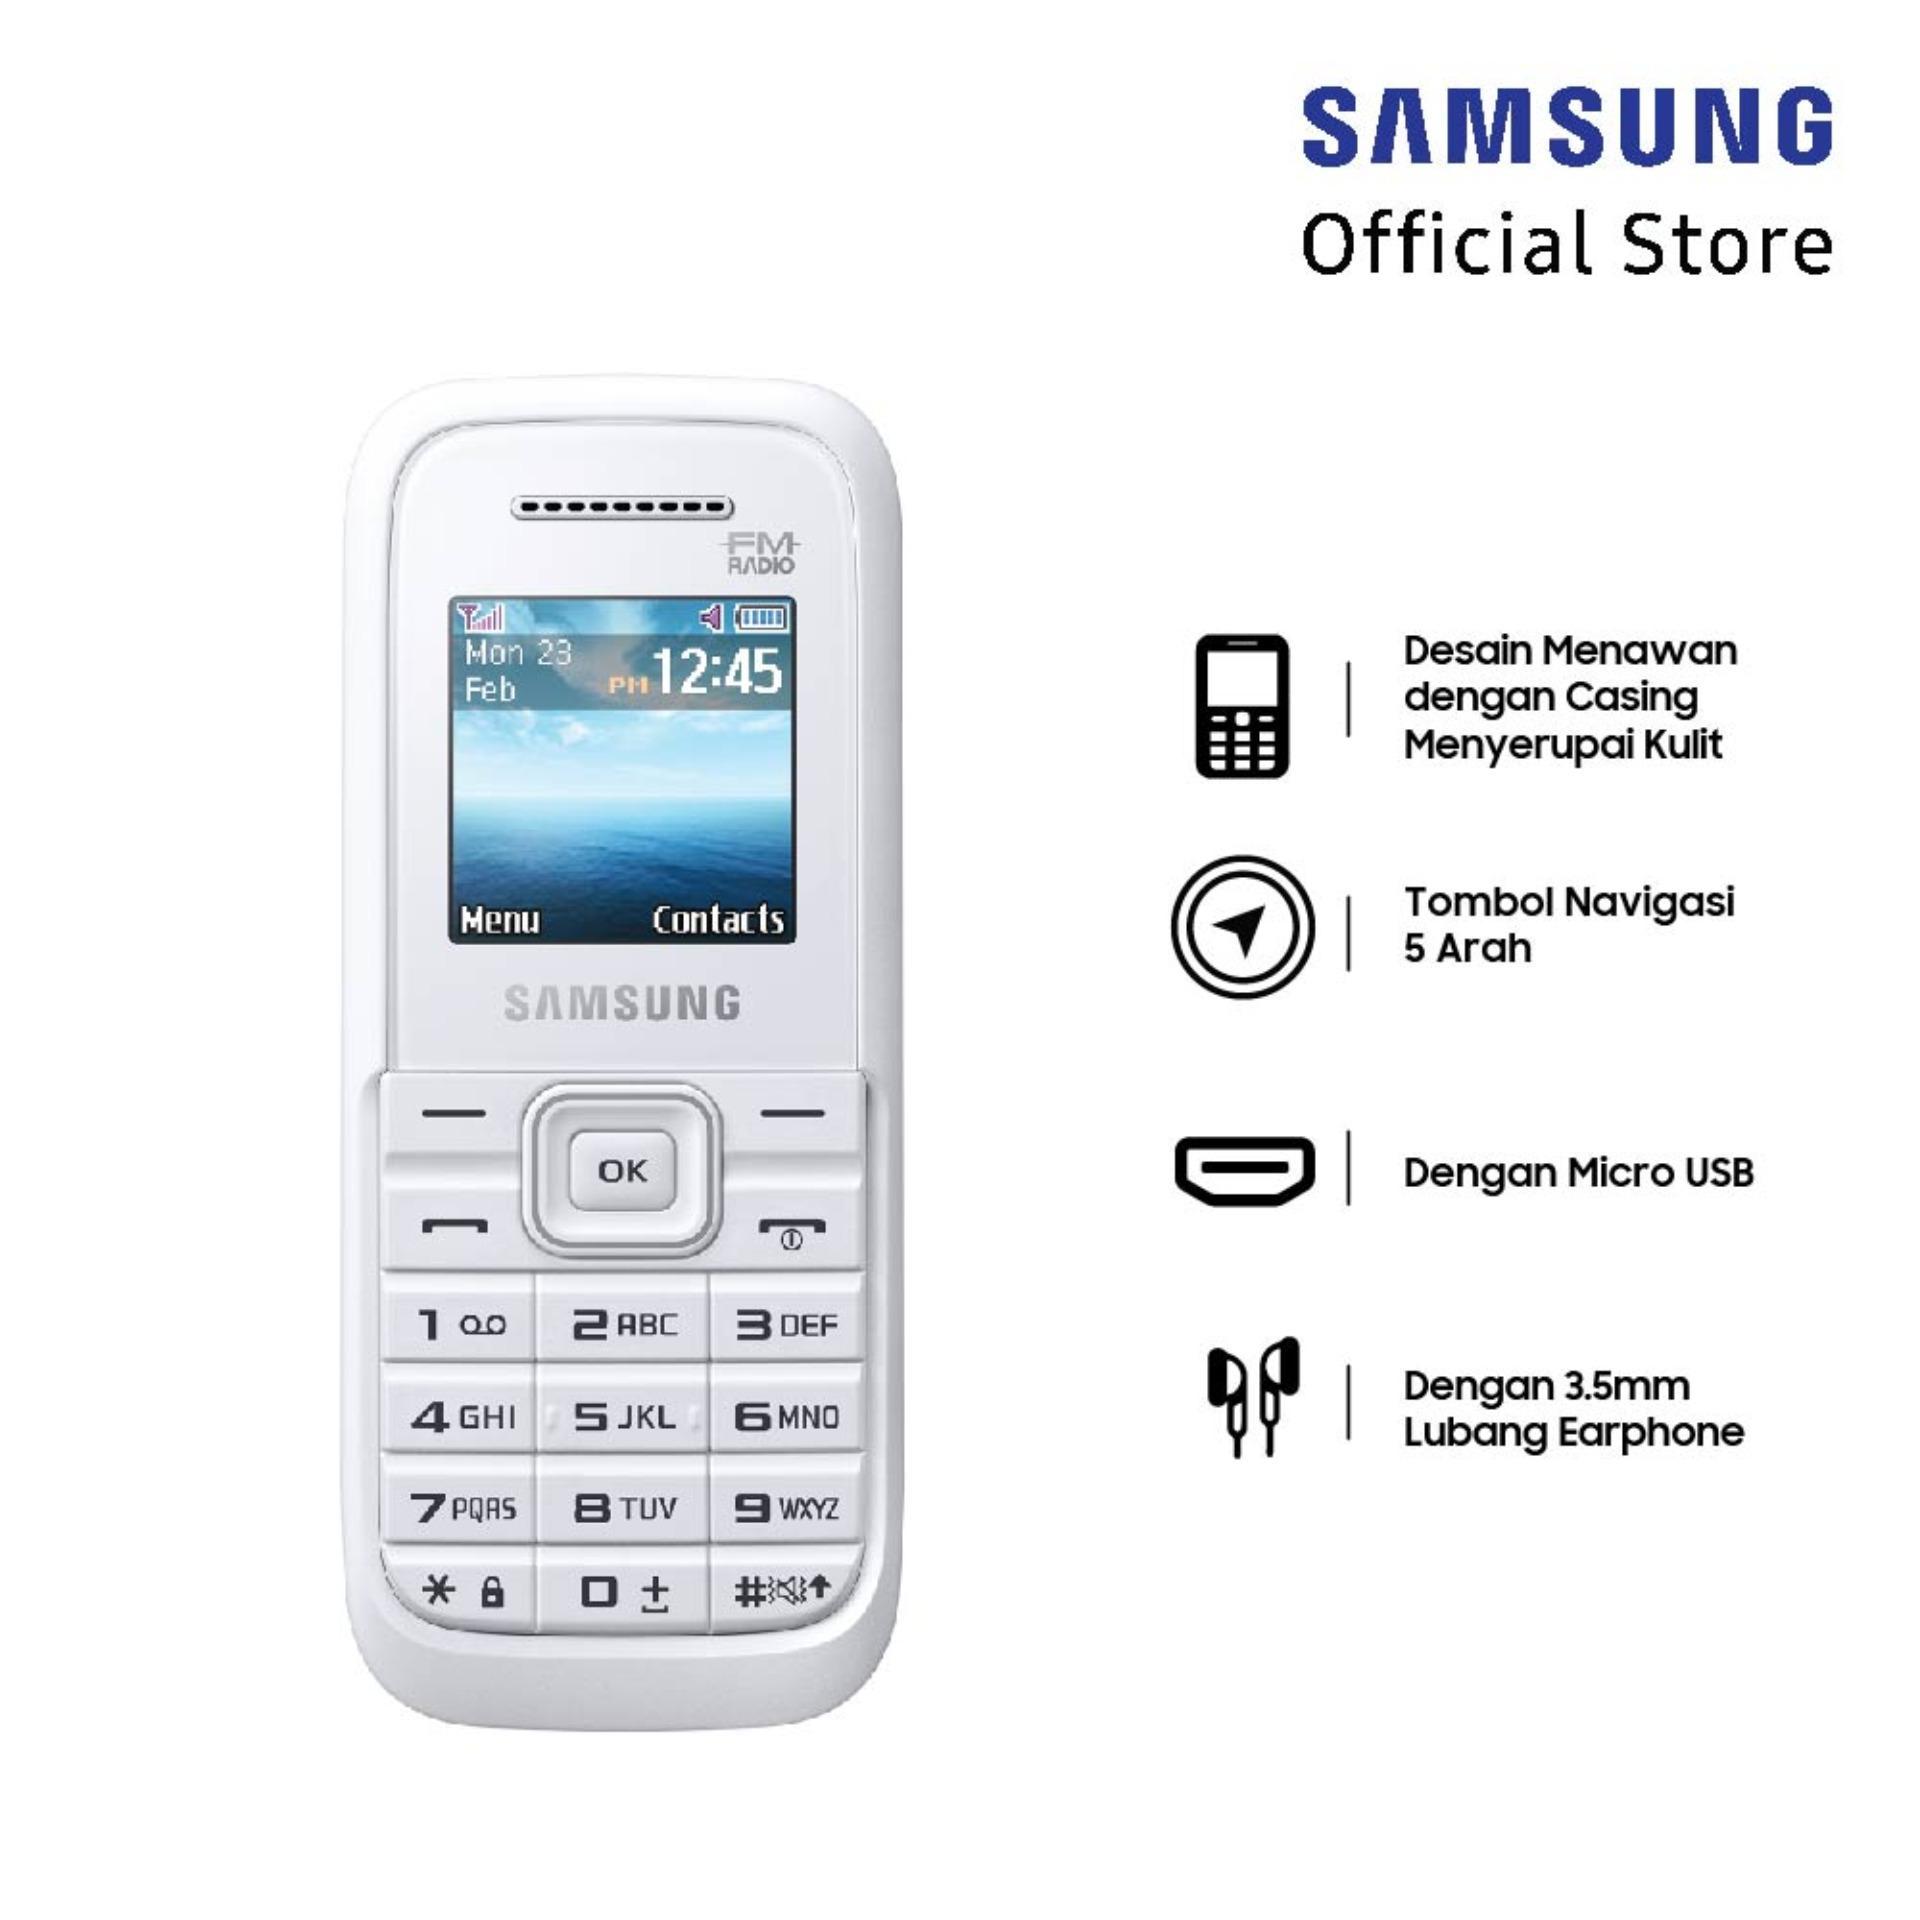 Samsung Keystone 3 SM-B109E - 1.5